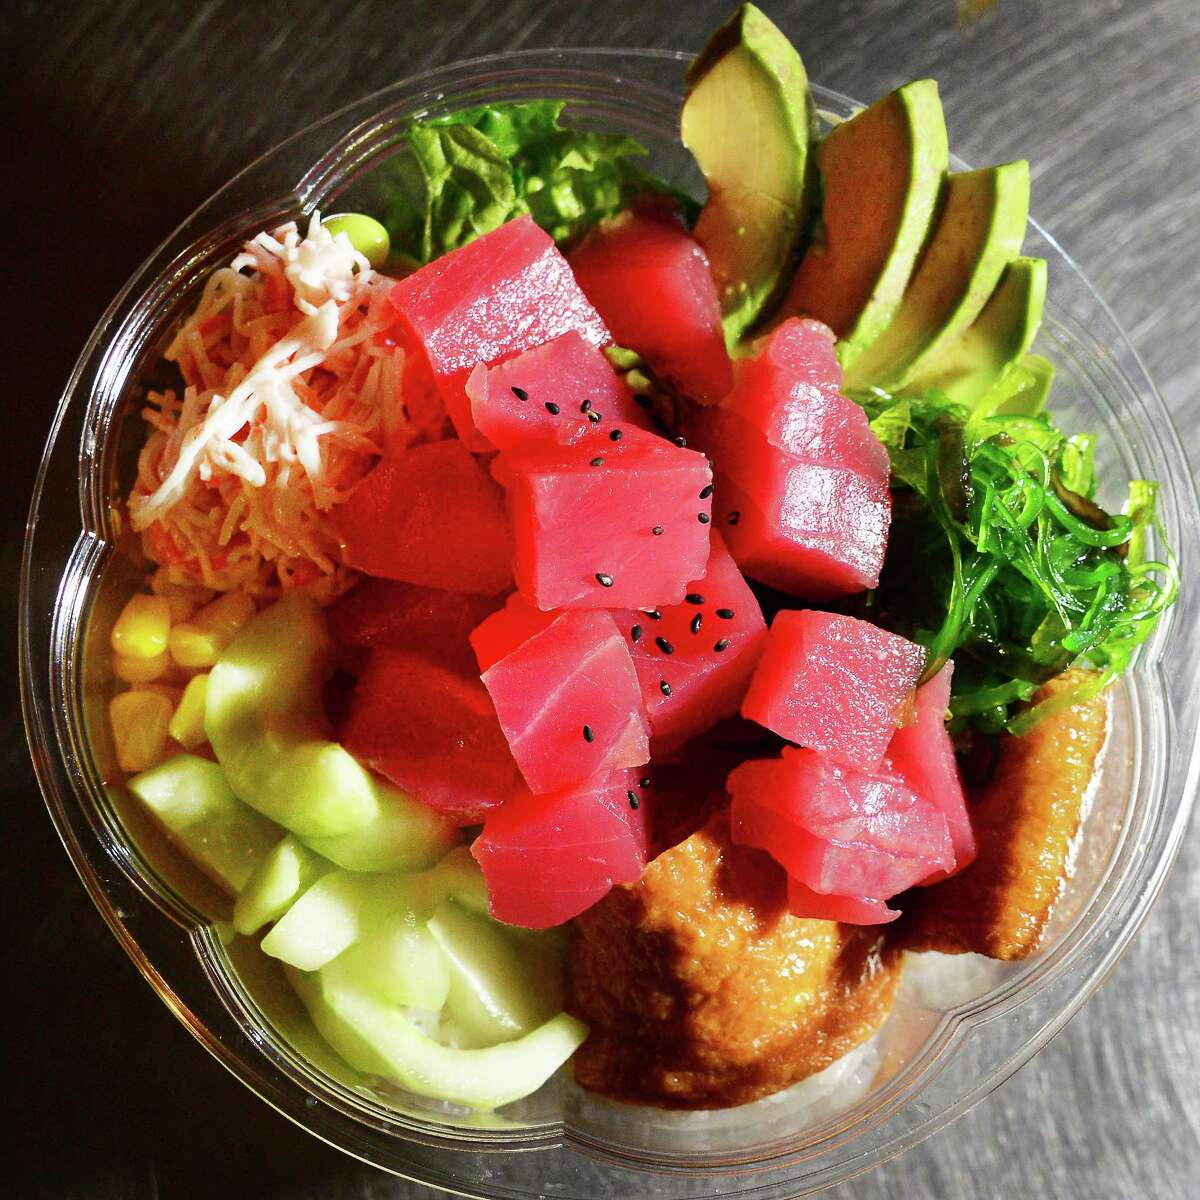 A tuna bowl at the Kobe sushi restaurant in Galleria 7 Friday Jan. 5, 2018 in Colonie, NY.